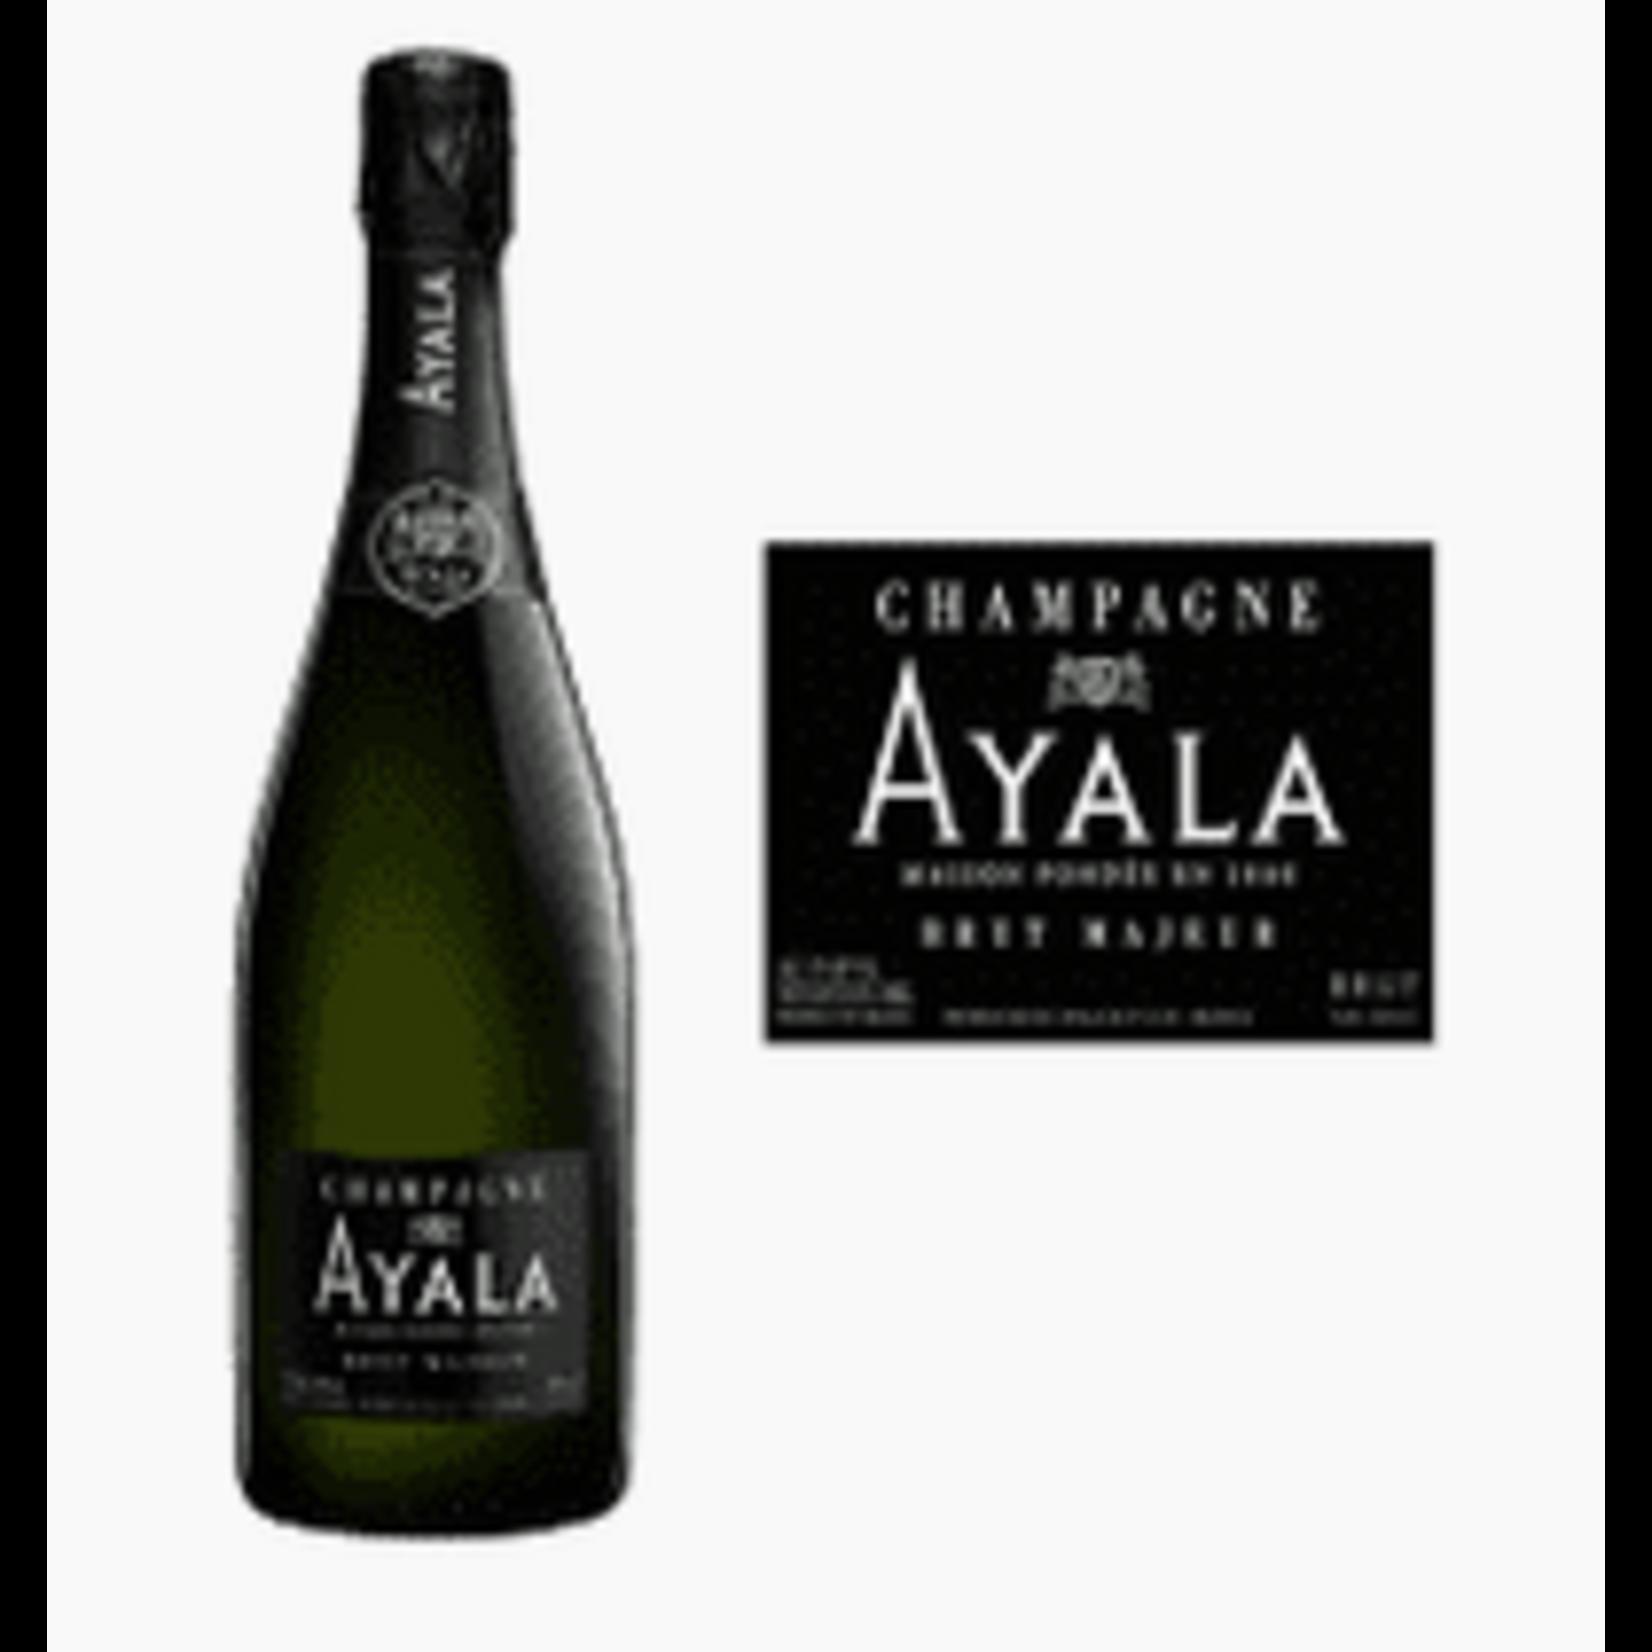 Ayala Ayala Brut Majeur Champagne 92pts WS, 90pts WE